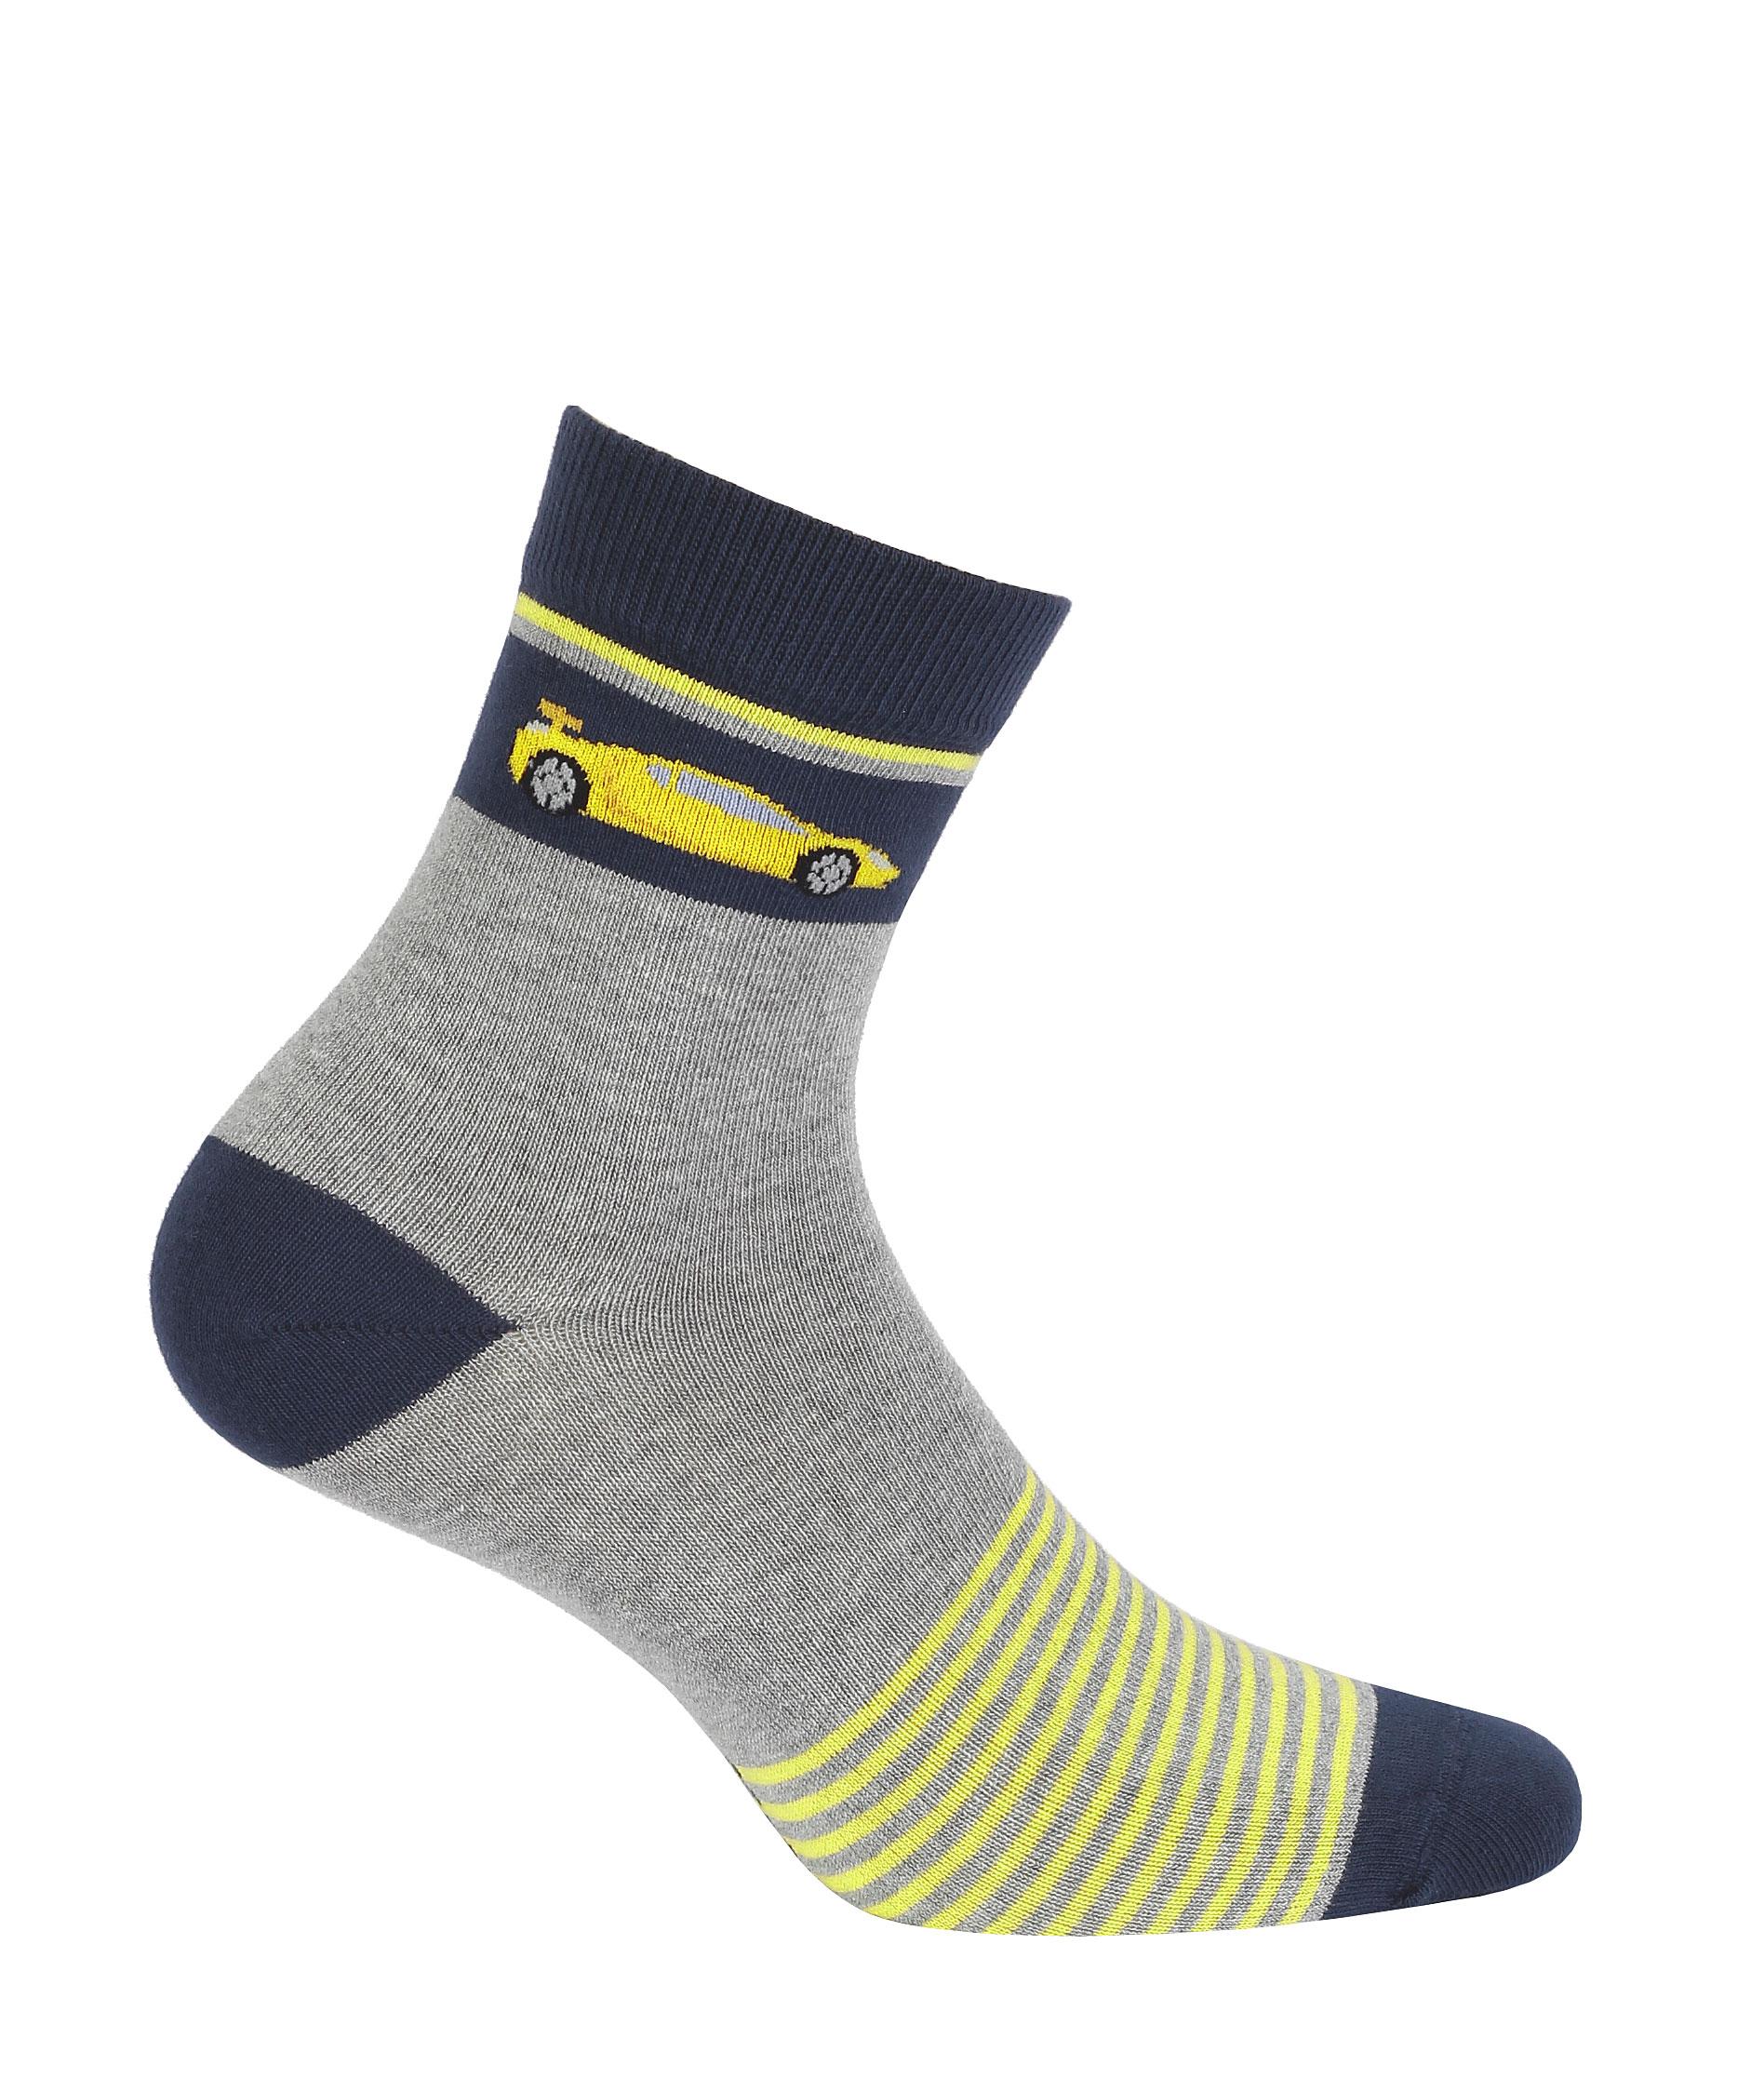 dětské ponožky vzor GATTA AUTO žluté proužky 33-35